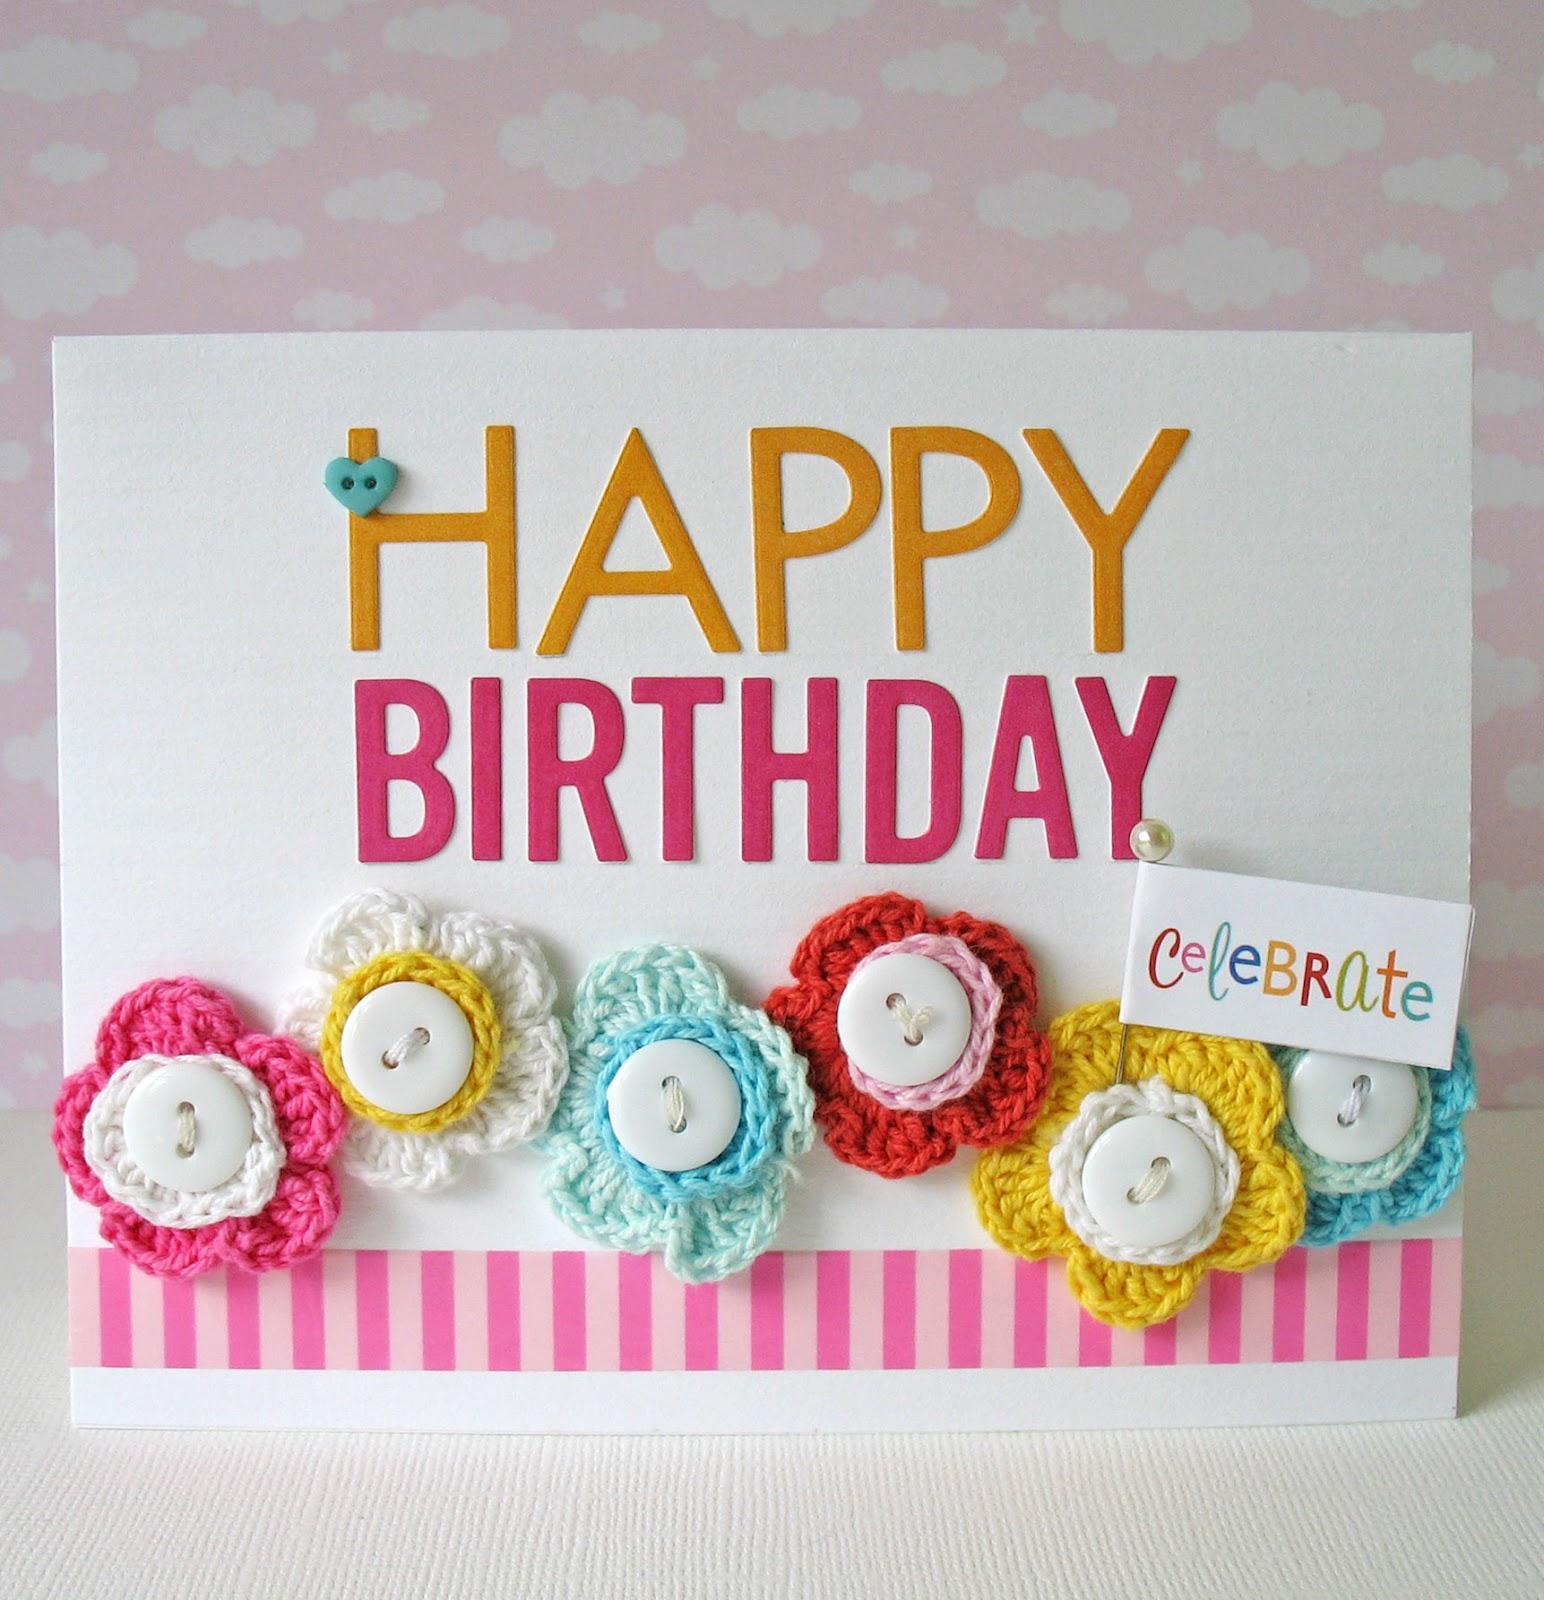 CardBlanc by Kathy Martin Happy Birthday Giveaway – Birthday Special Card